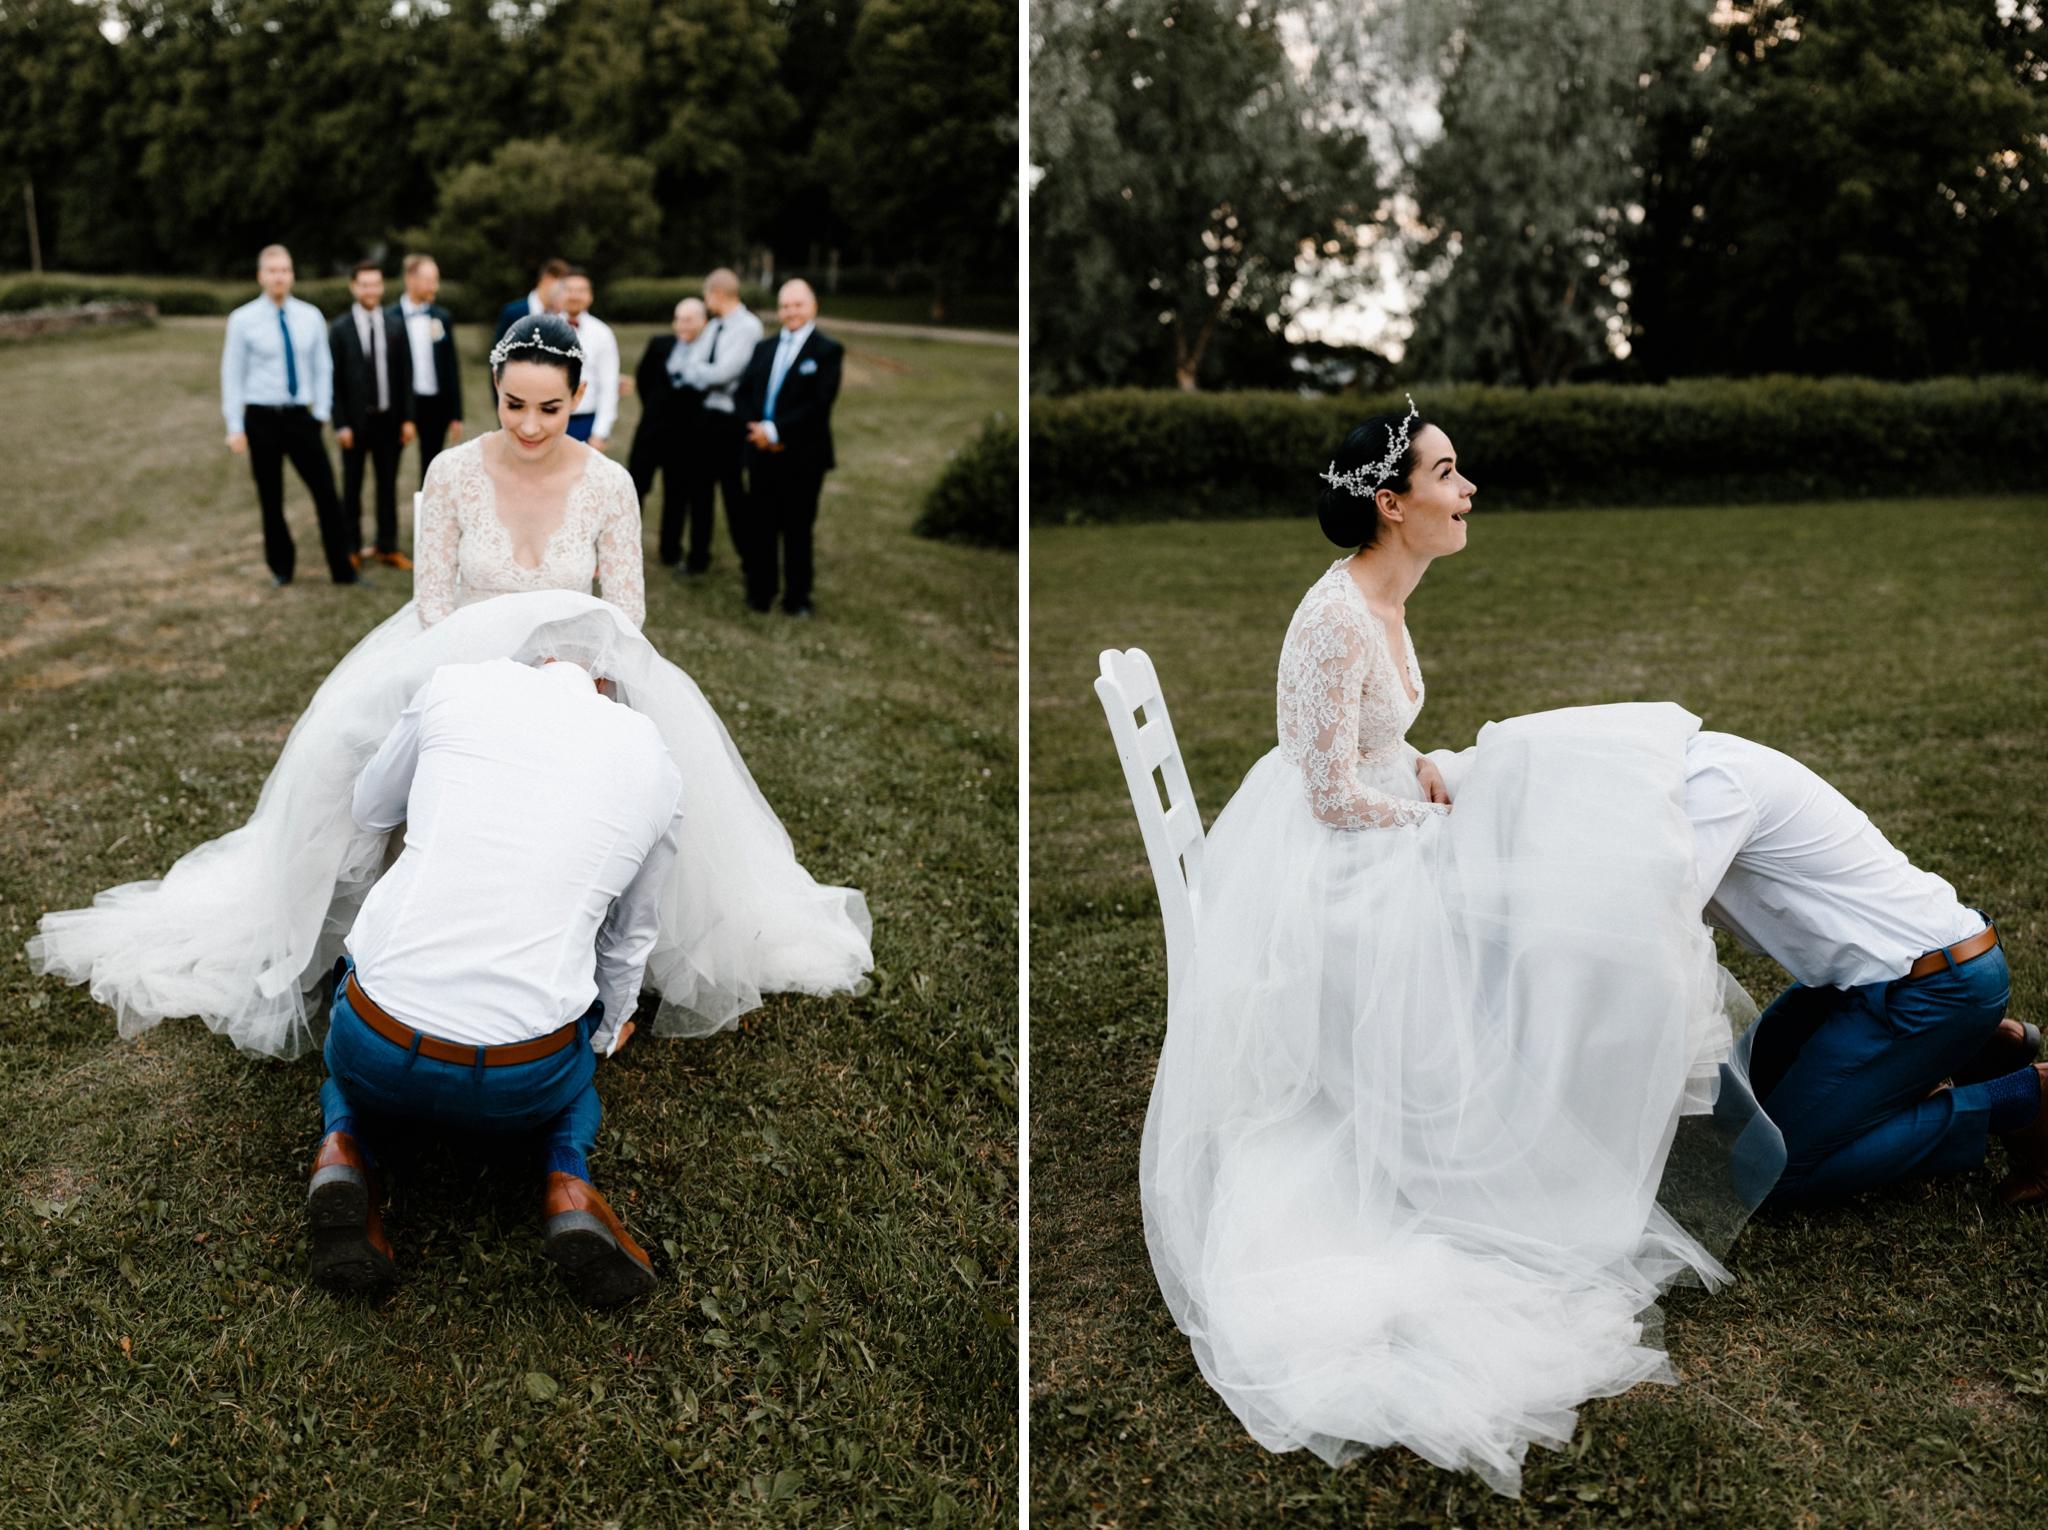 Essi + Ville   Oitbacka Gården   by Patrick Karkkolainen Wedding Photography-315.jpg